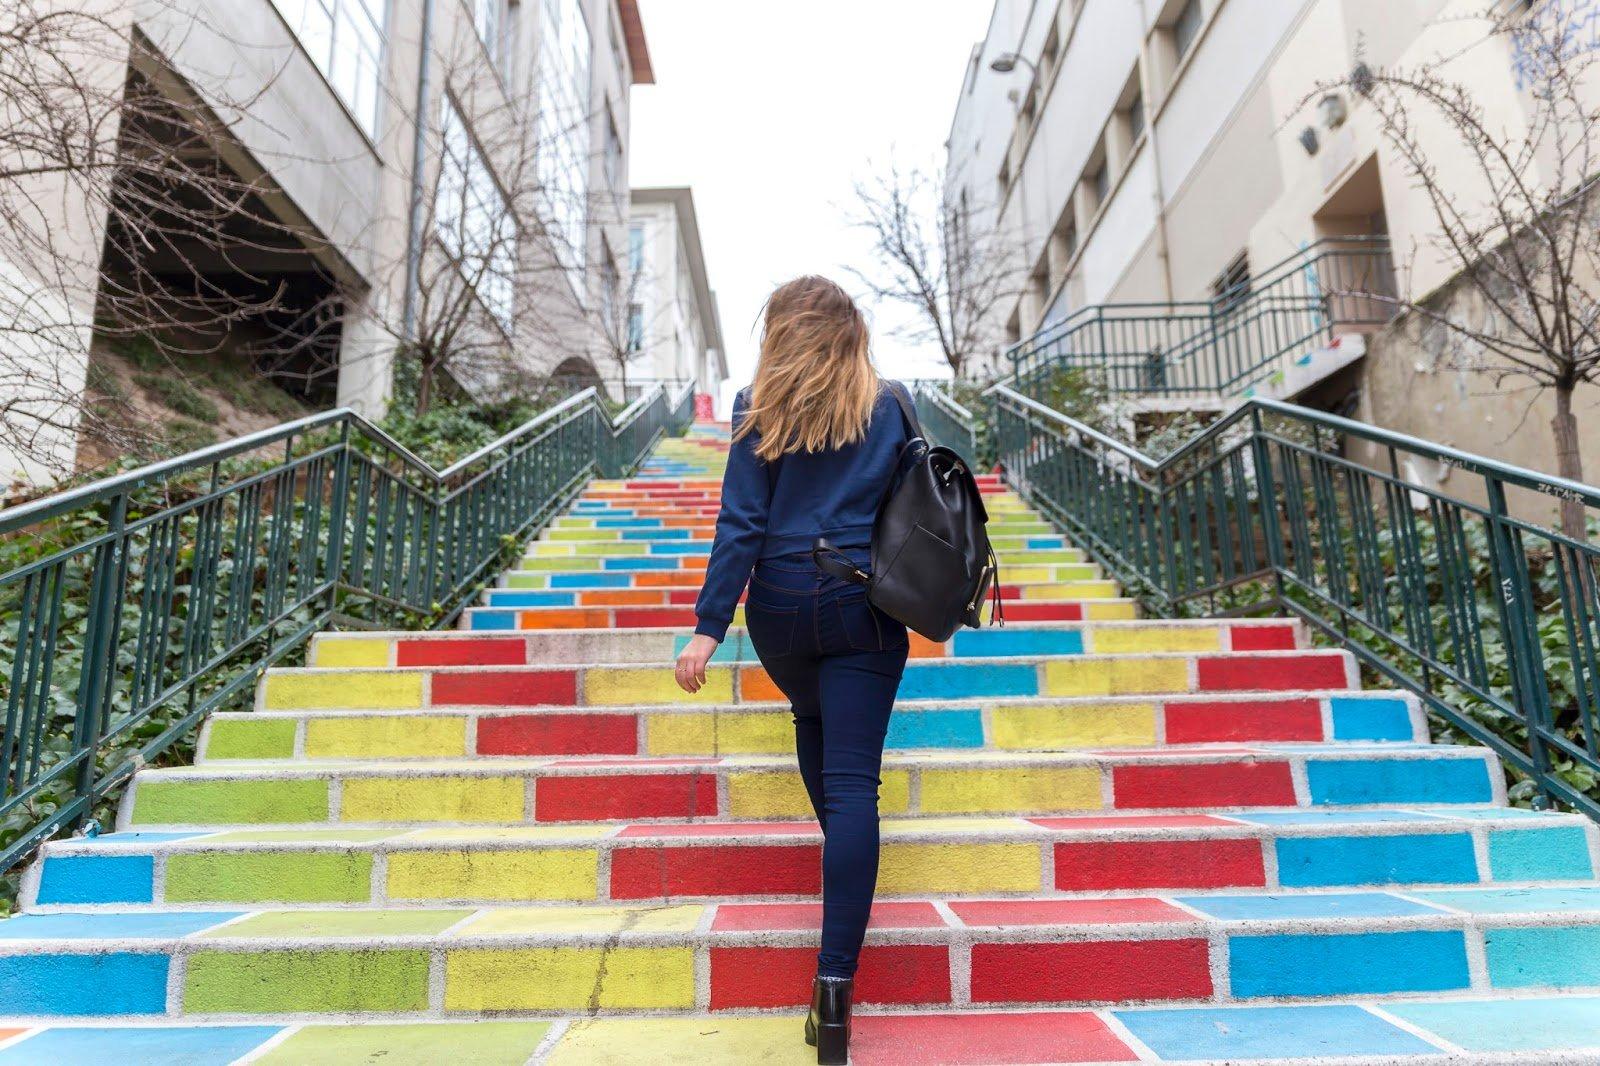 Escalier Prunelle Lyon